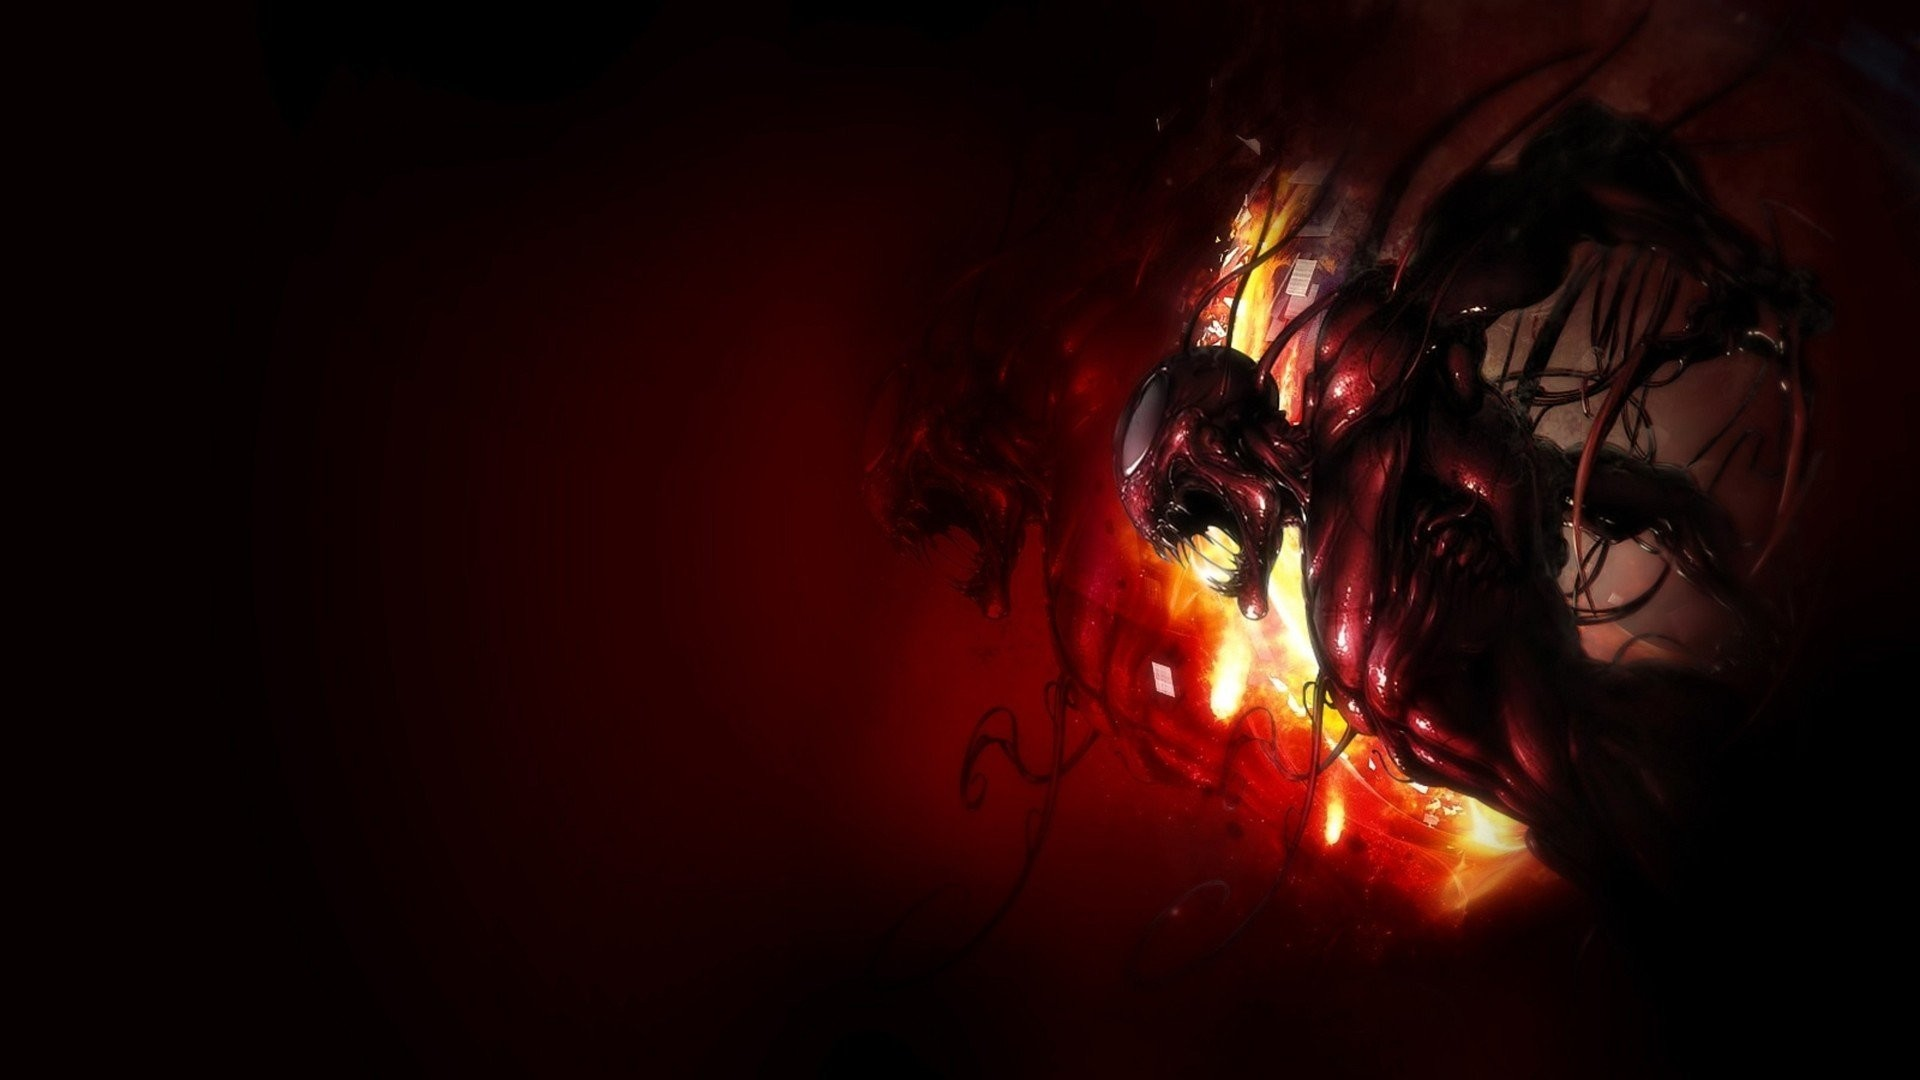 دانلود Warhammer 40000 Carnage 263674 بازی اکشن اندروید!